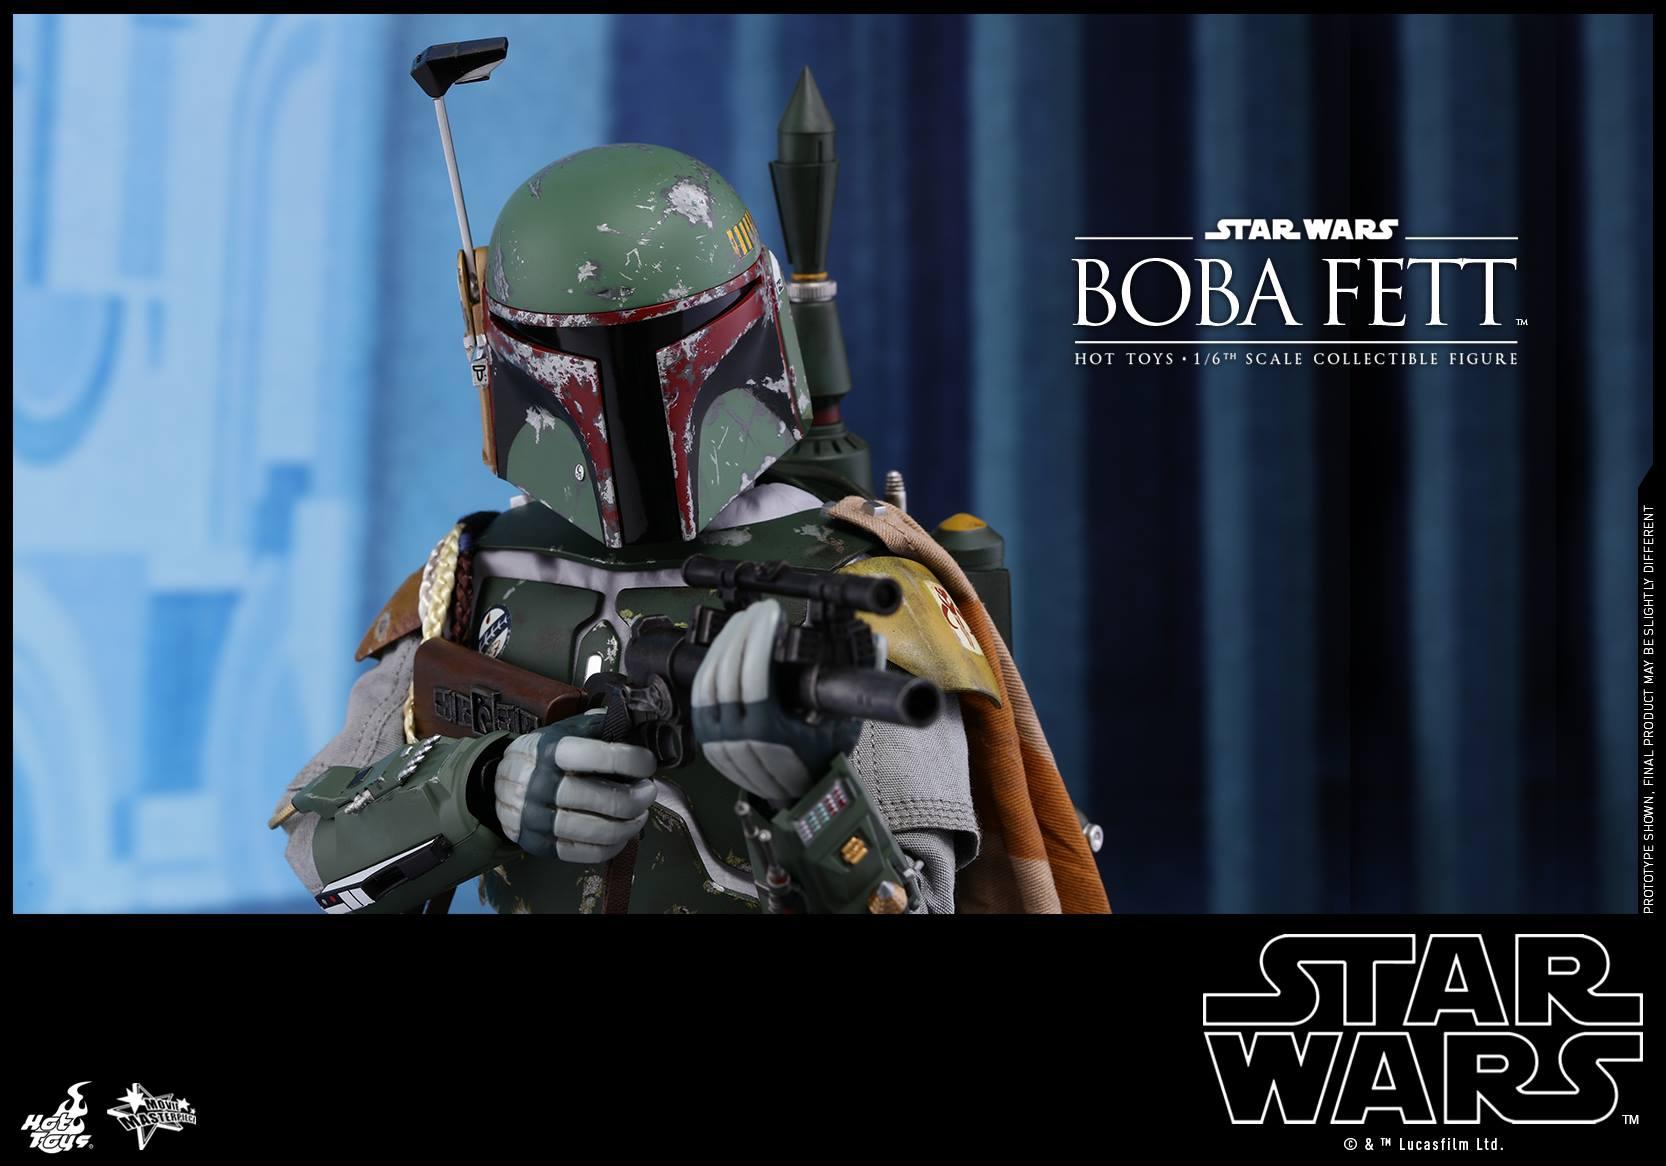 Hot-Toys-Empre-Strikes-Back-Boba-Fett-007